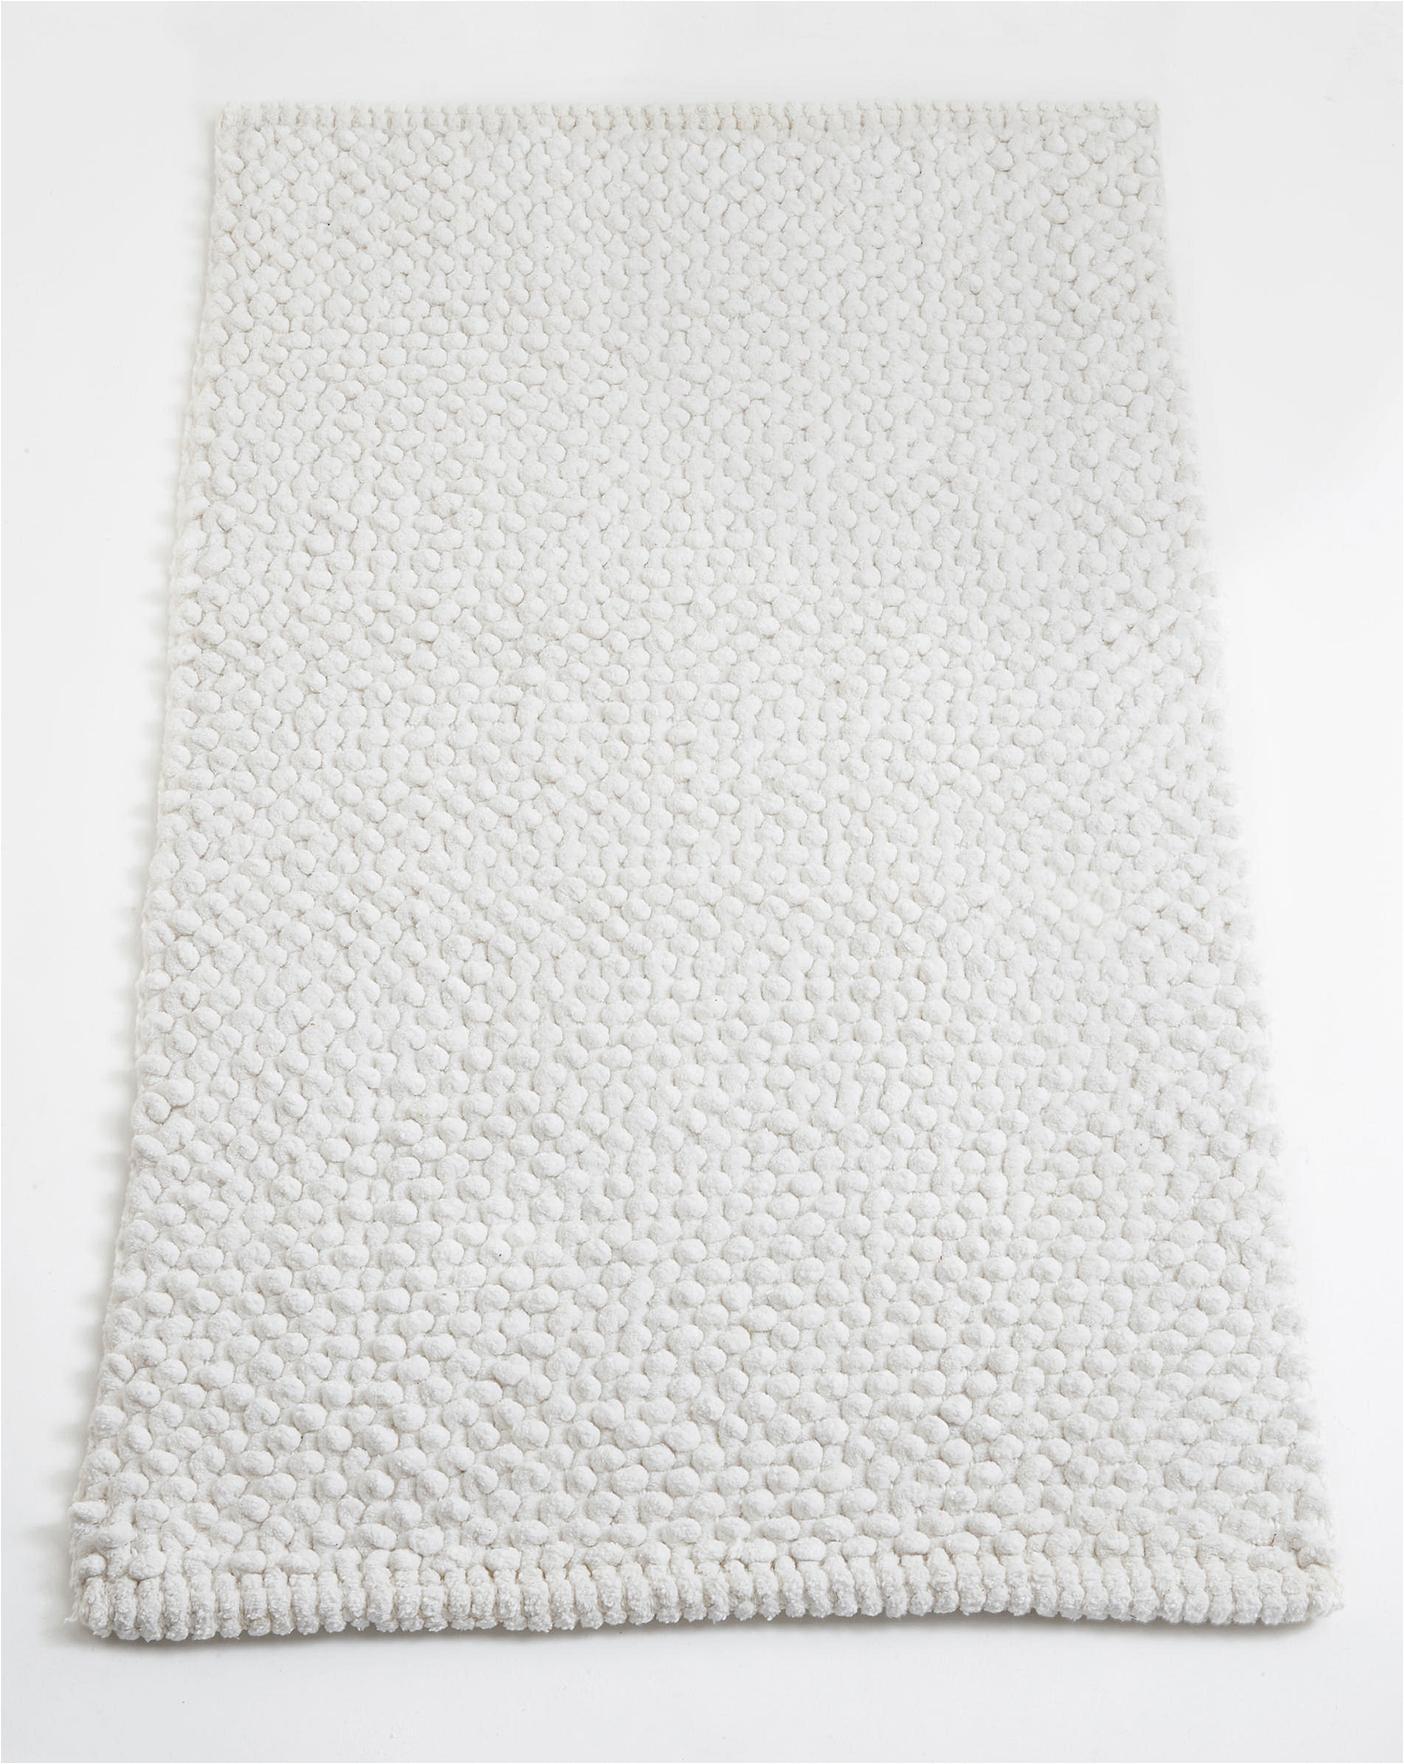 Cotton Bath Rugs Made In Usa Cotton Bobble Bath Mats White